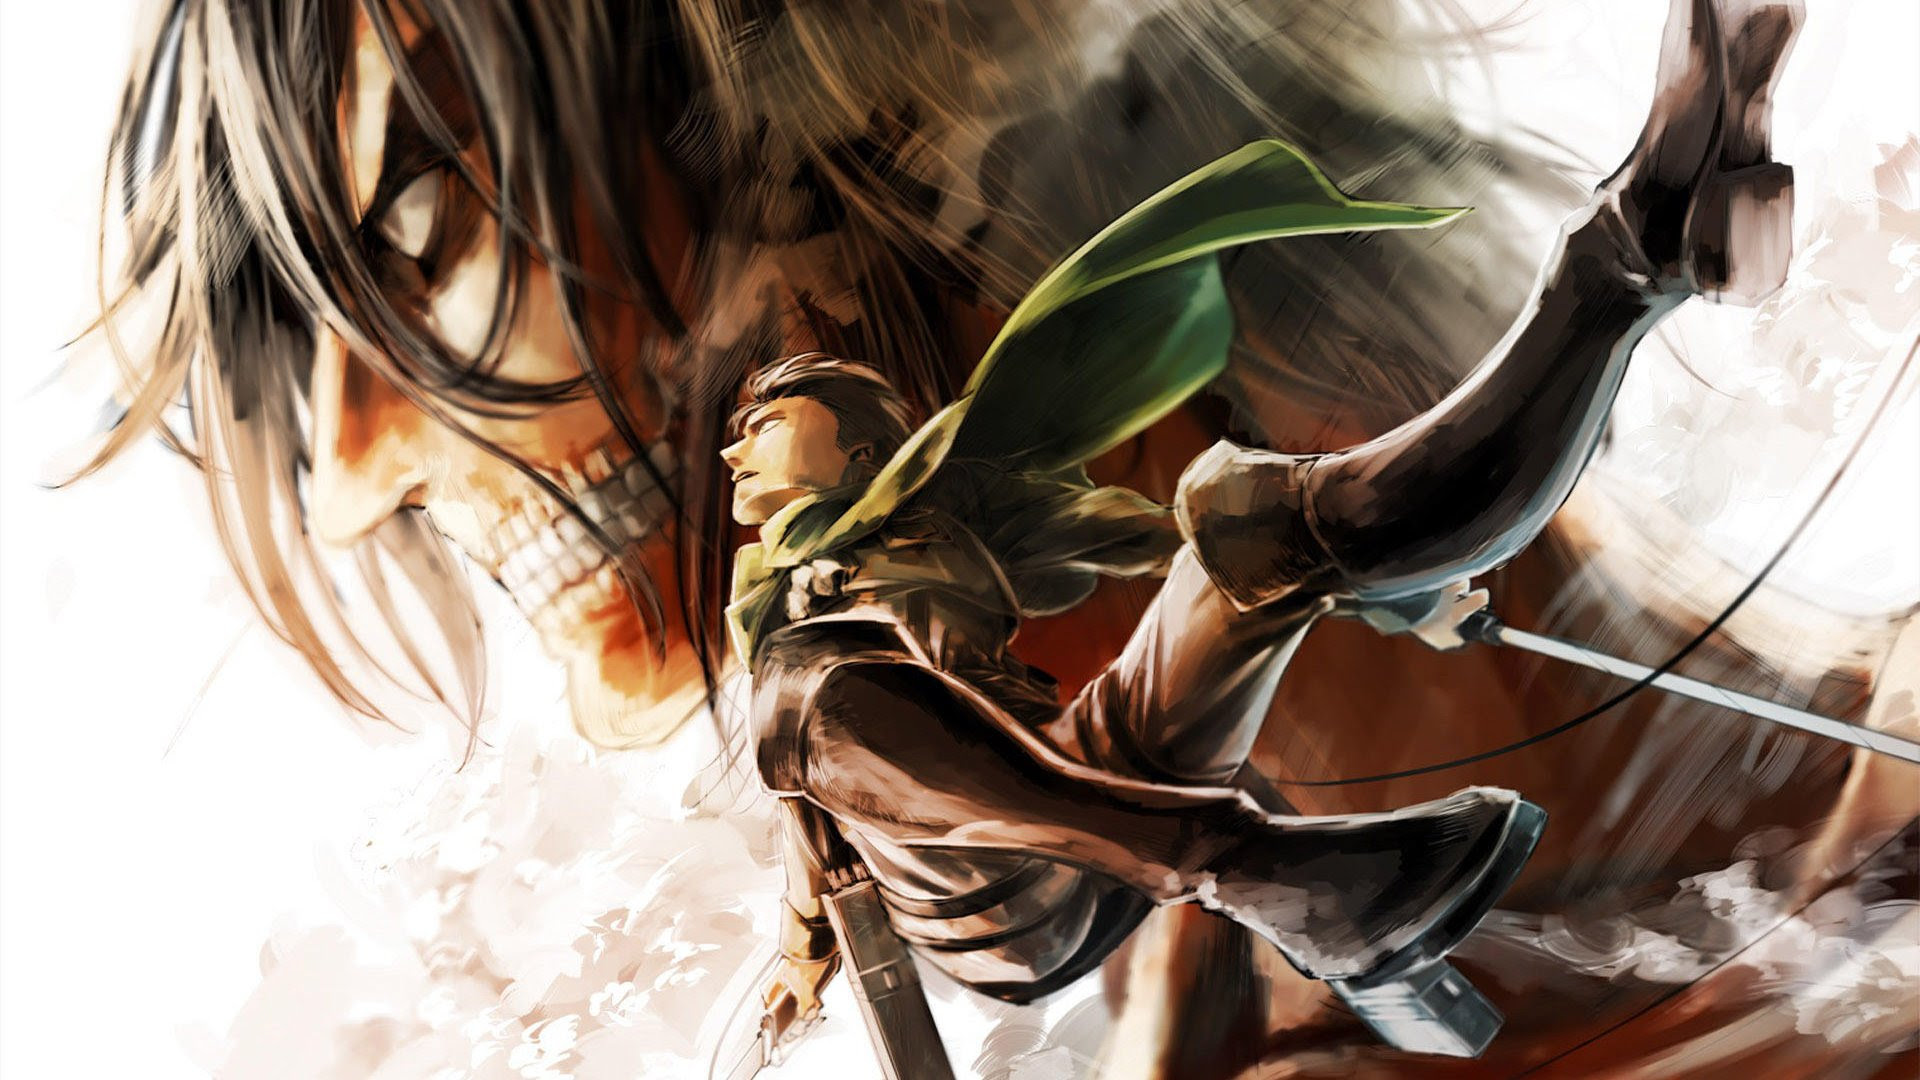 Myanime Wallpaper When Will Attack On Titan Season 4 Wallpaper